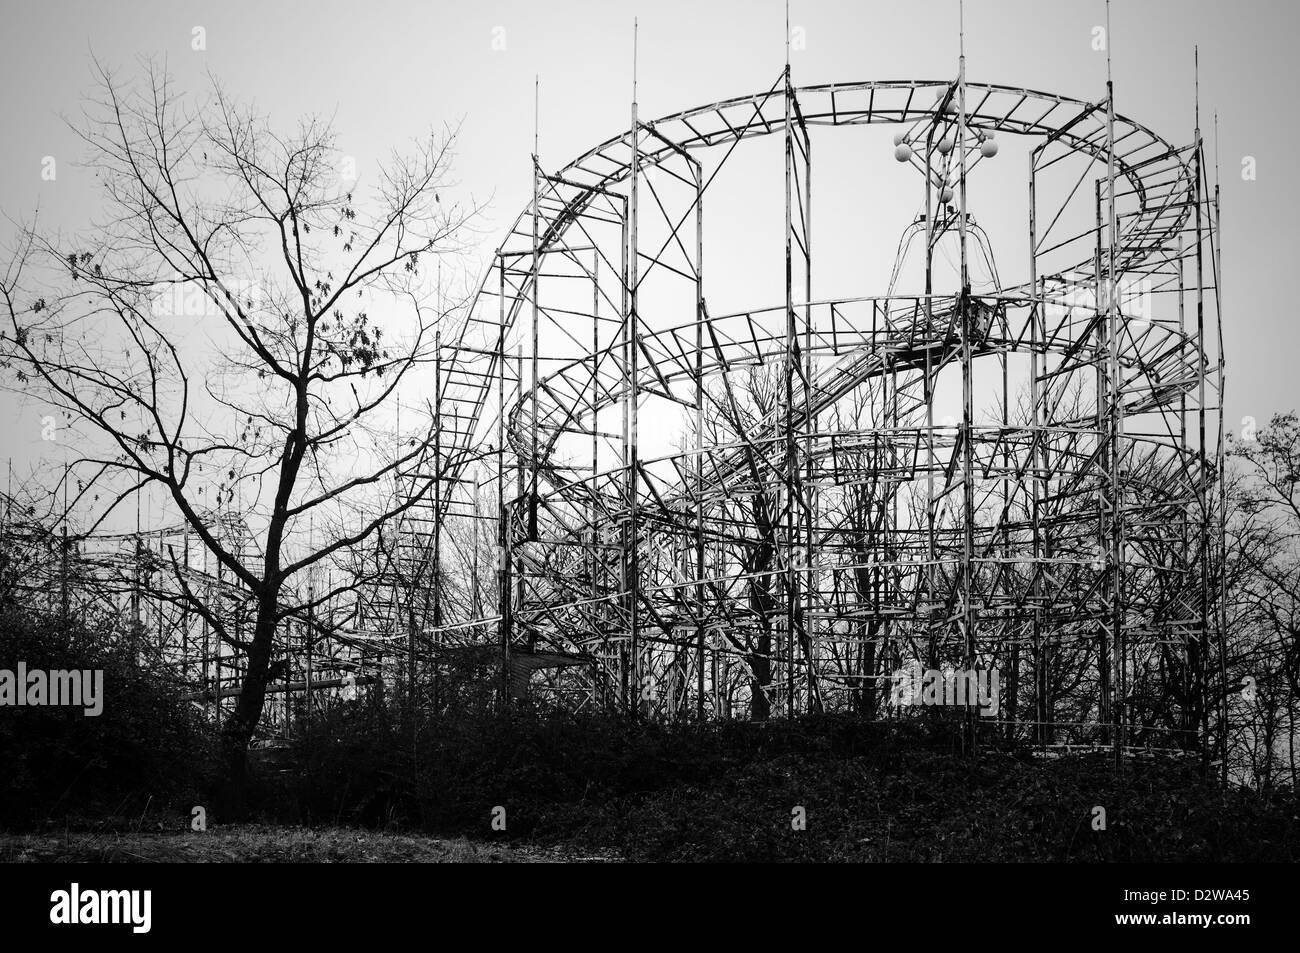 Abandoned fun fair. Roller coaster - Stock Image